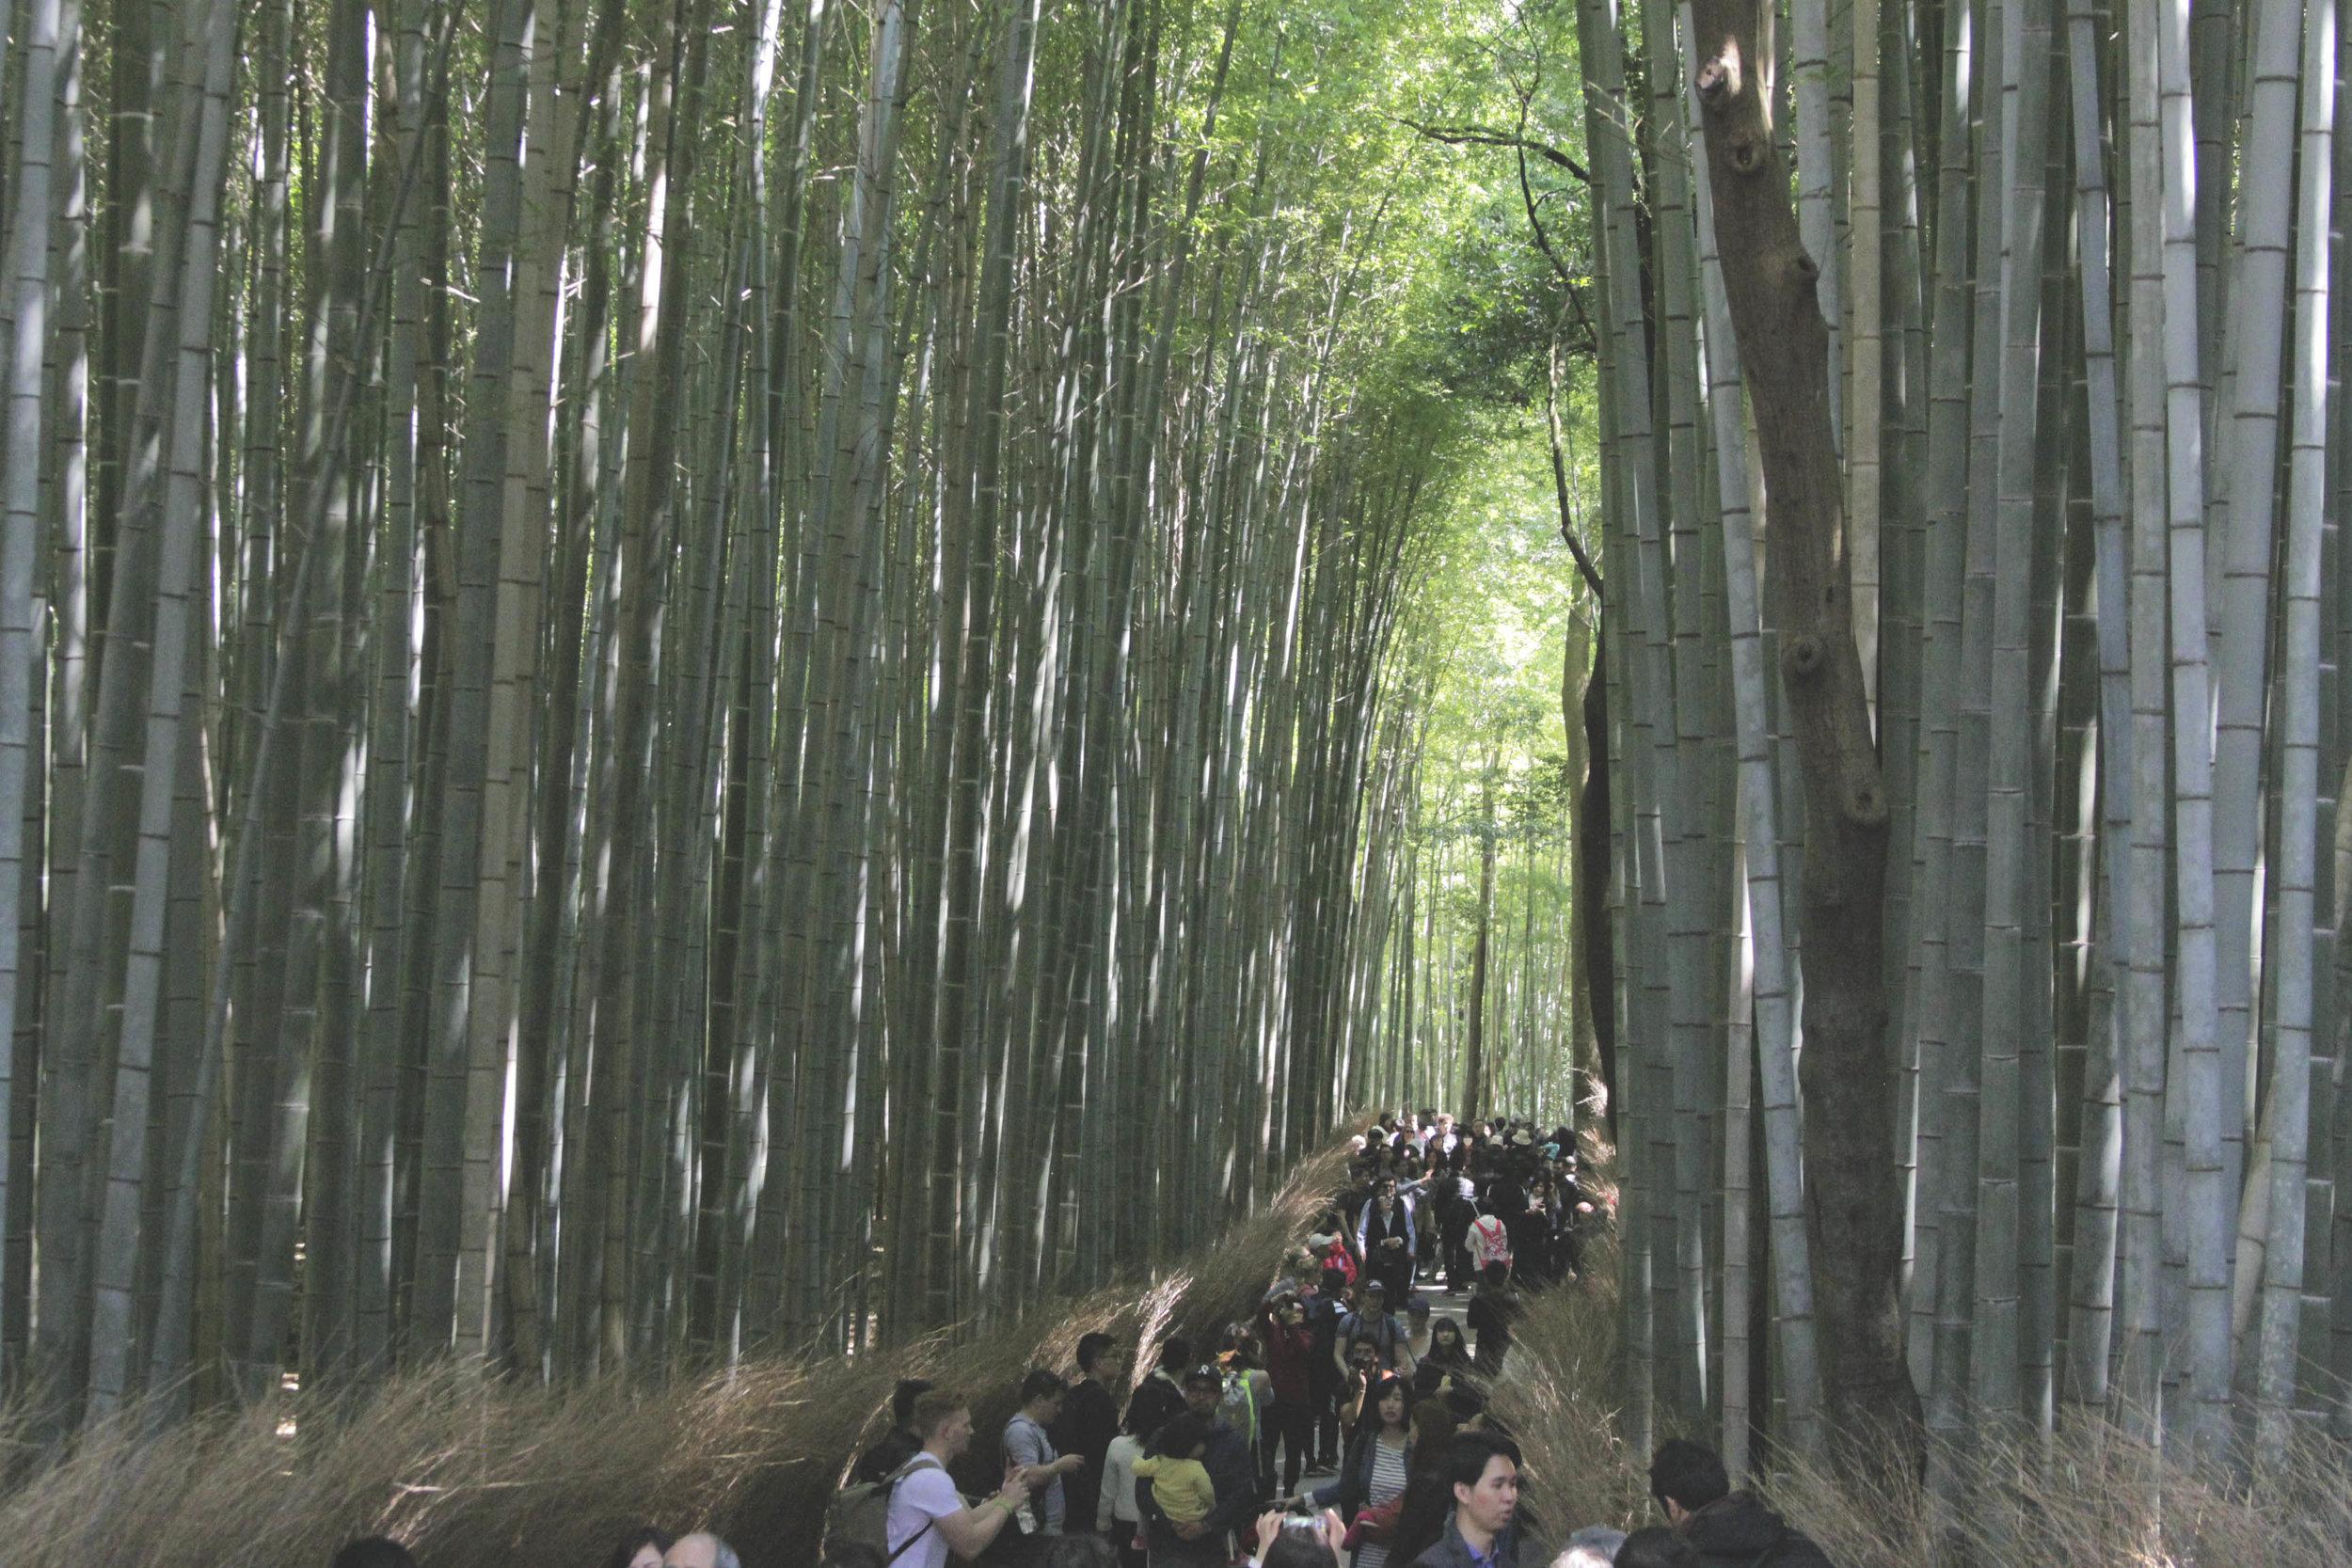 Caminho que corta a floresta de bambus de Arashiyama